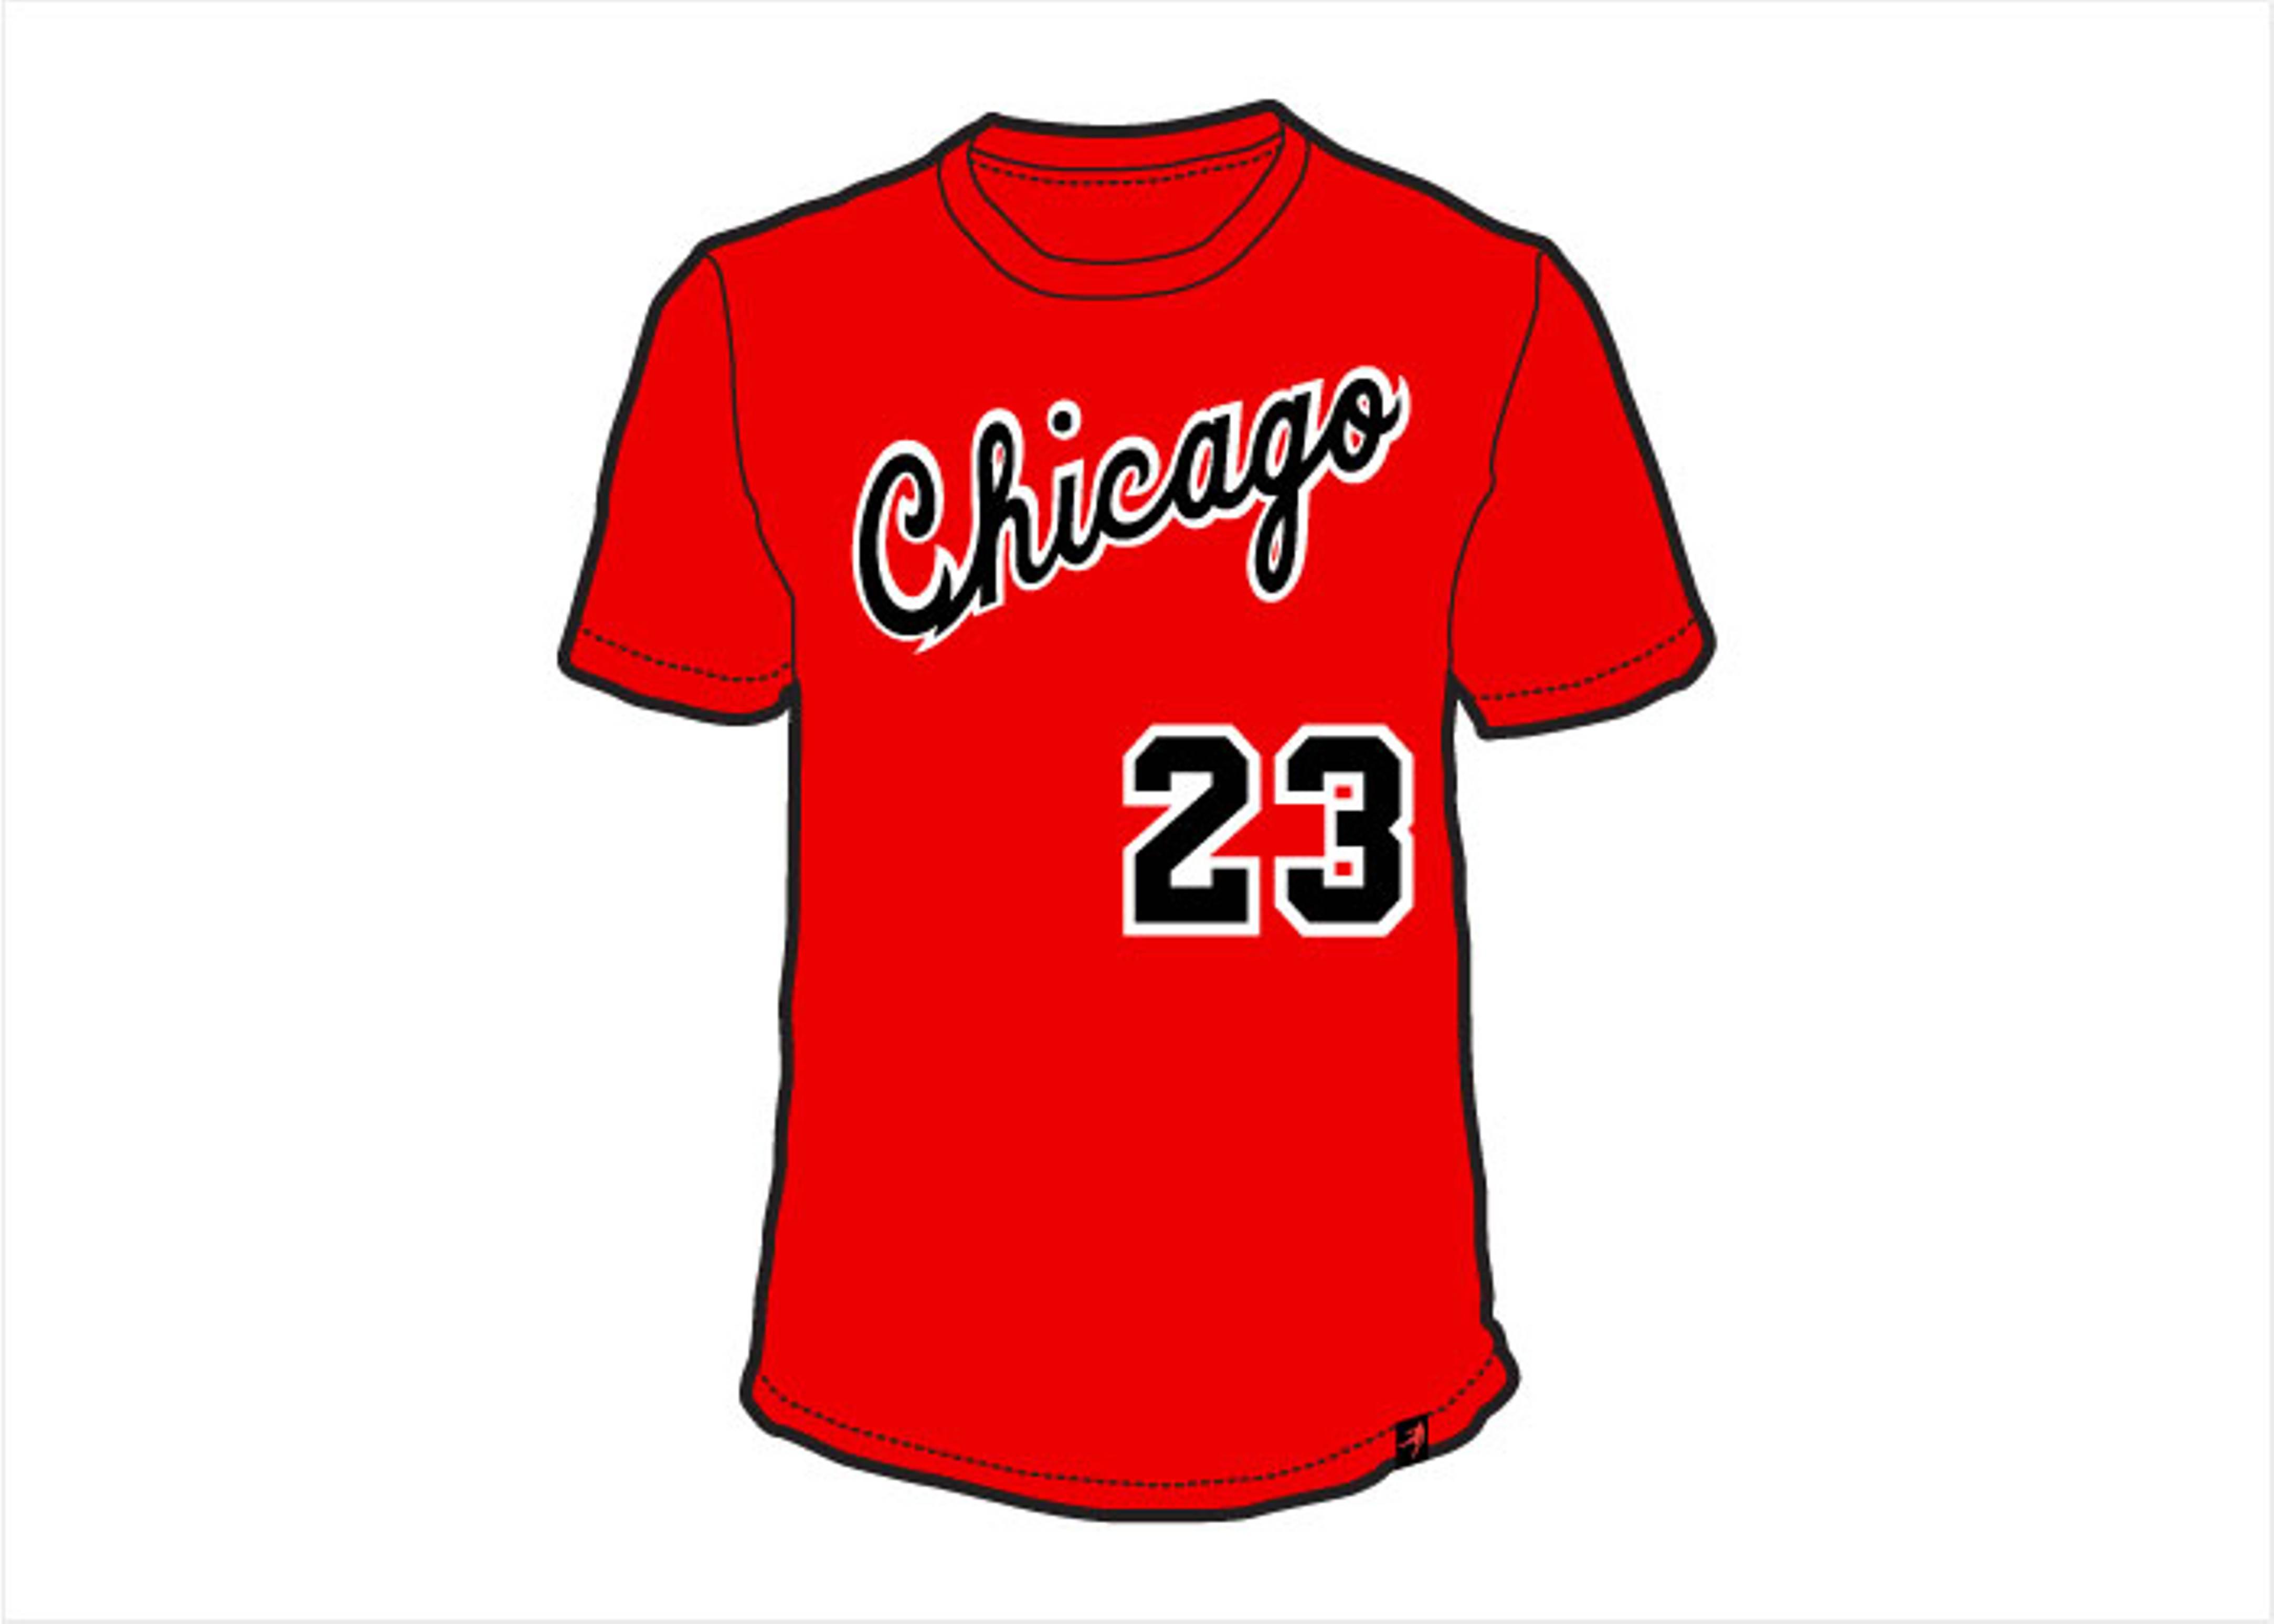 chicago 23 t-shirt